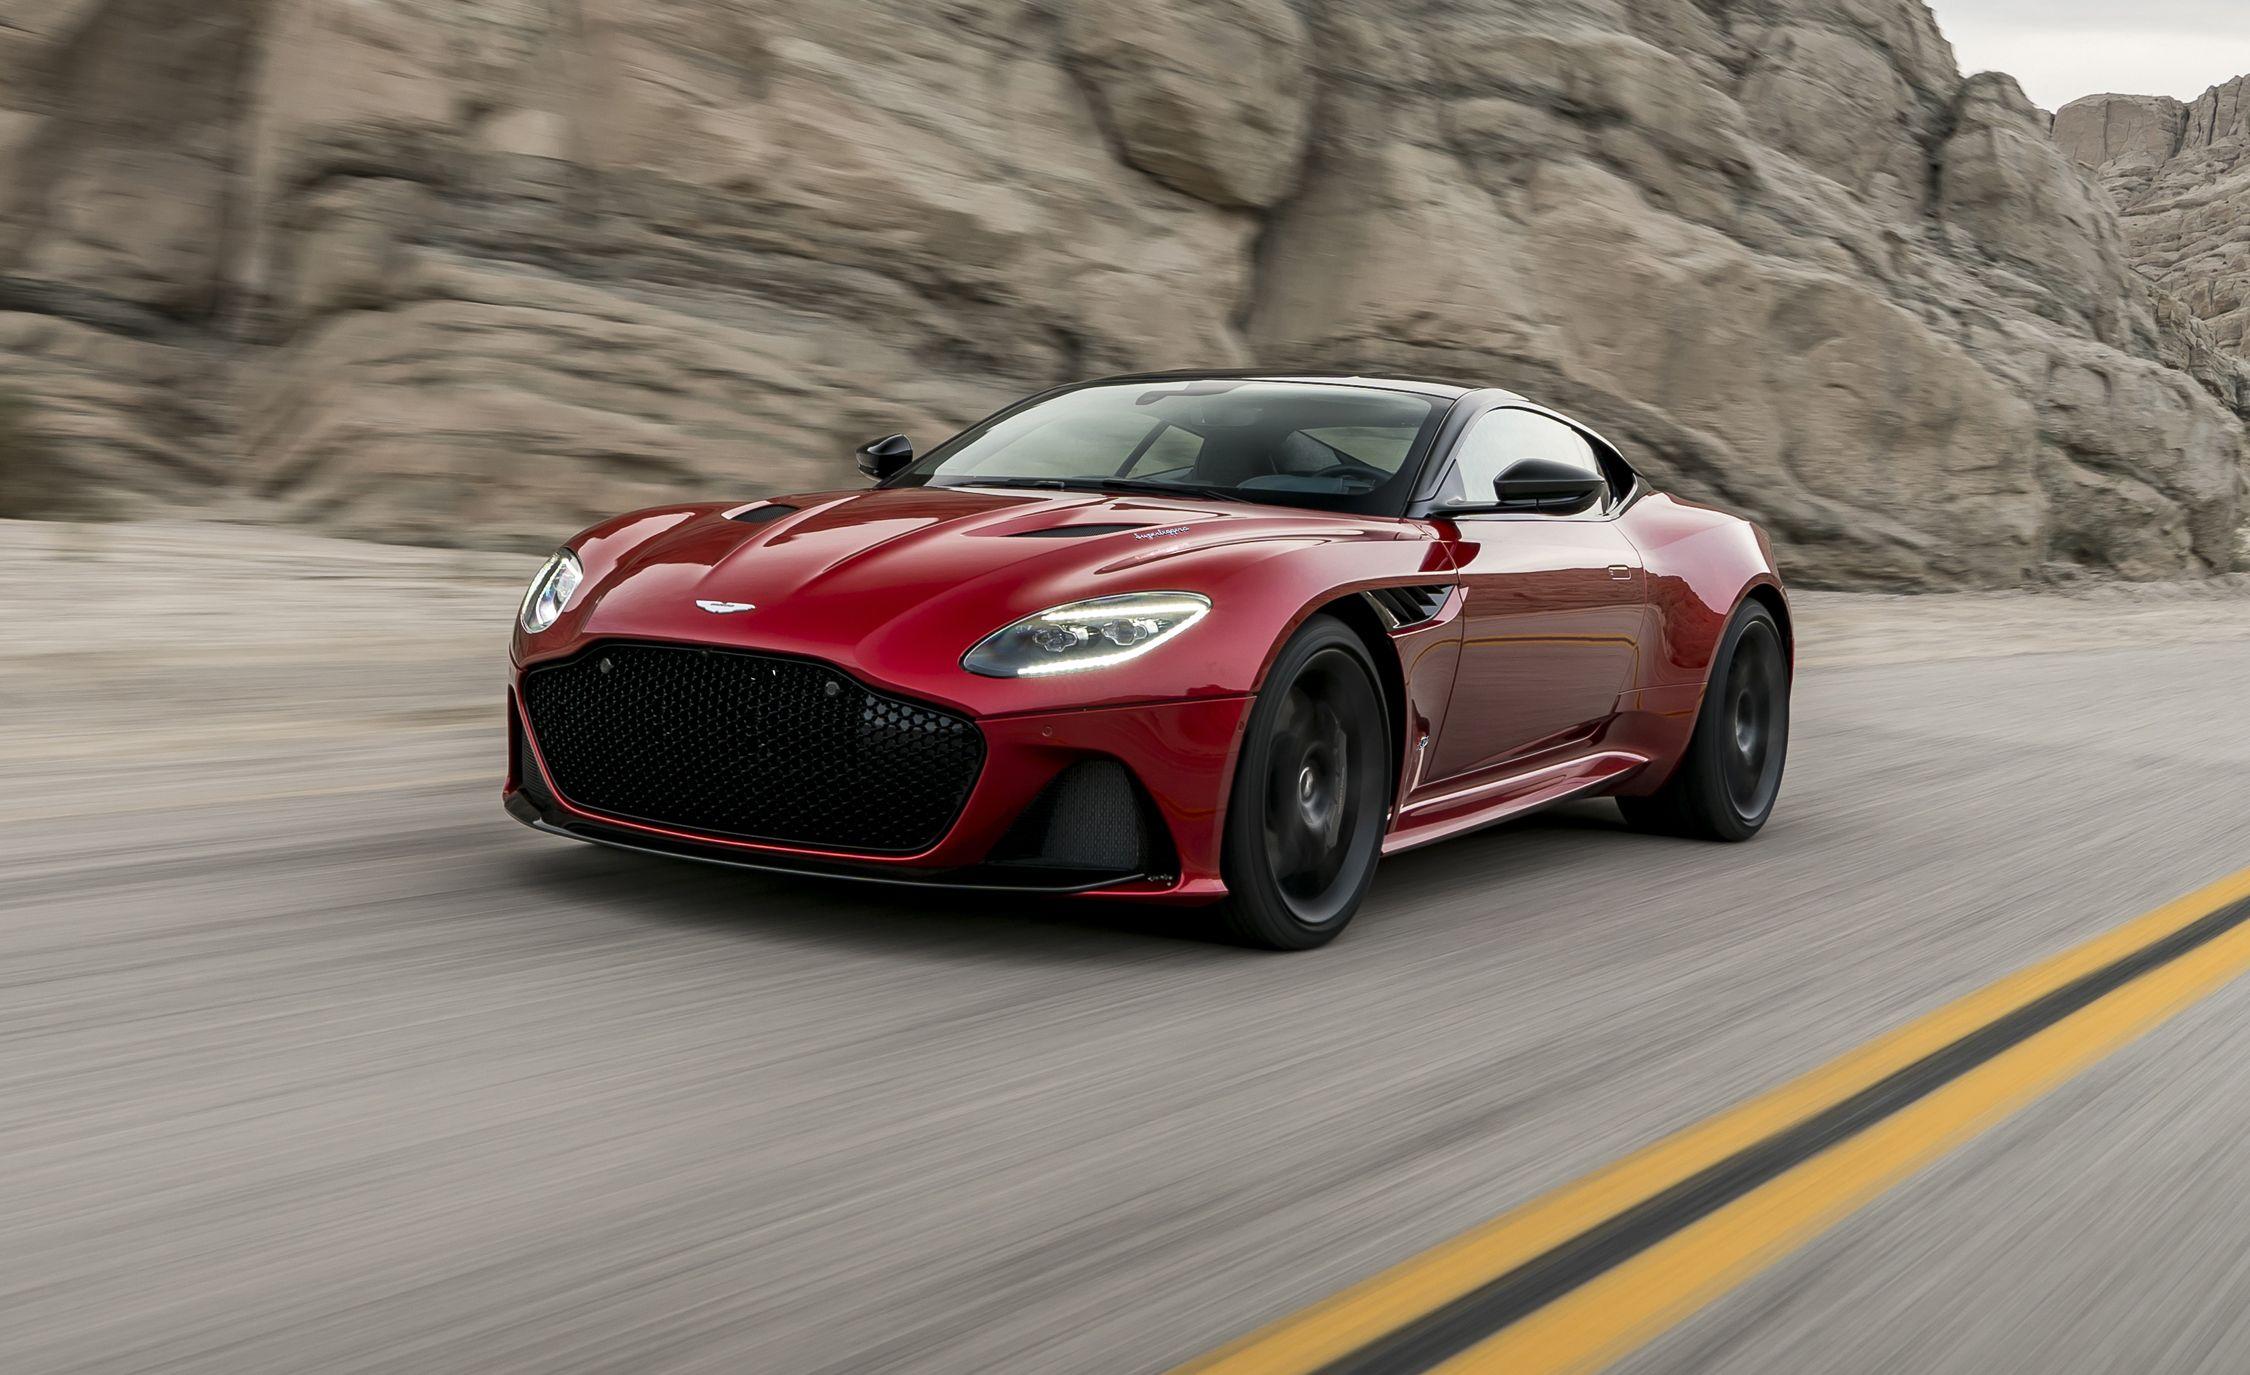 700 Club: 2019 Aston Martin DBS Superleggera Revealed